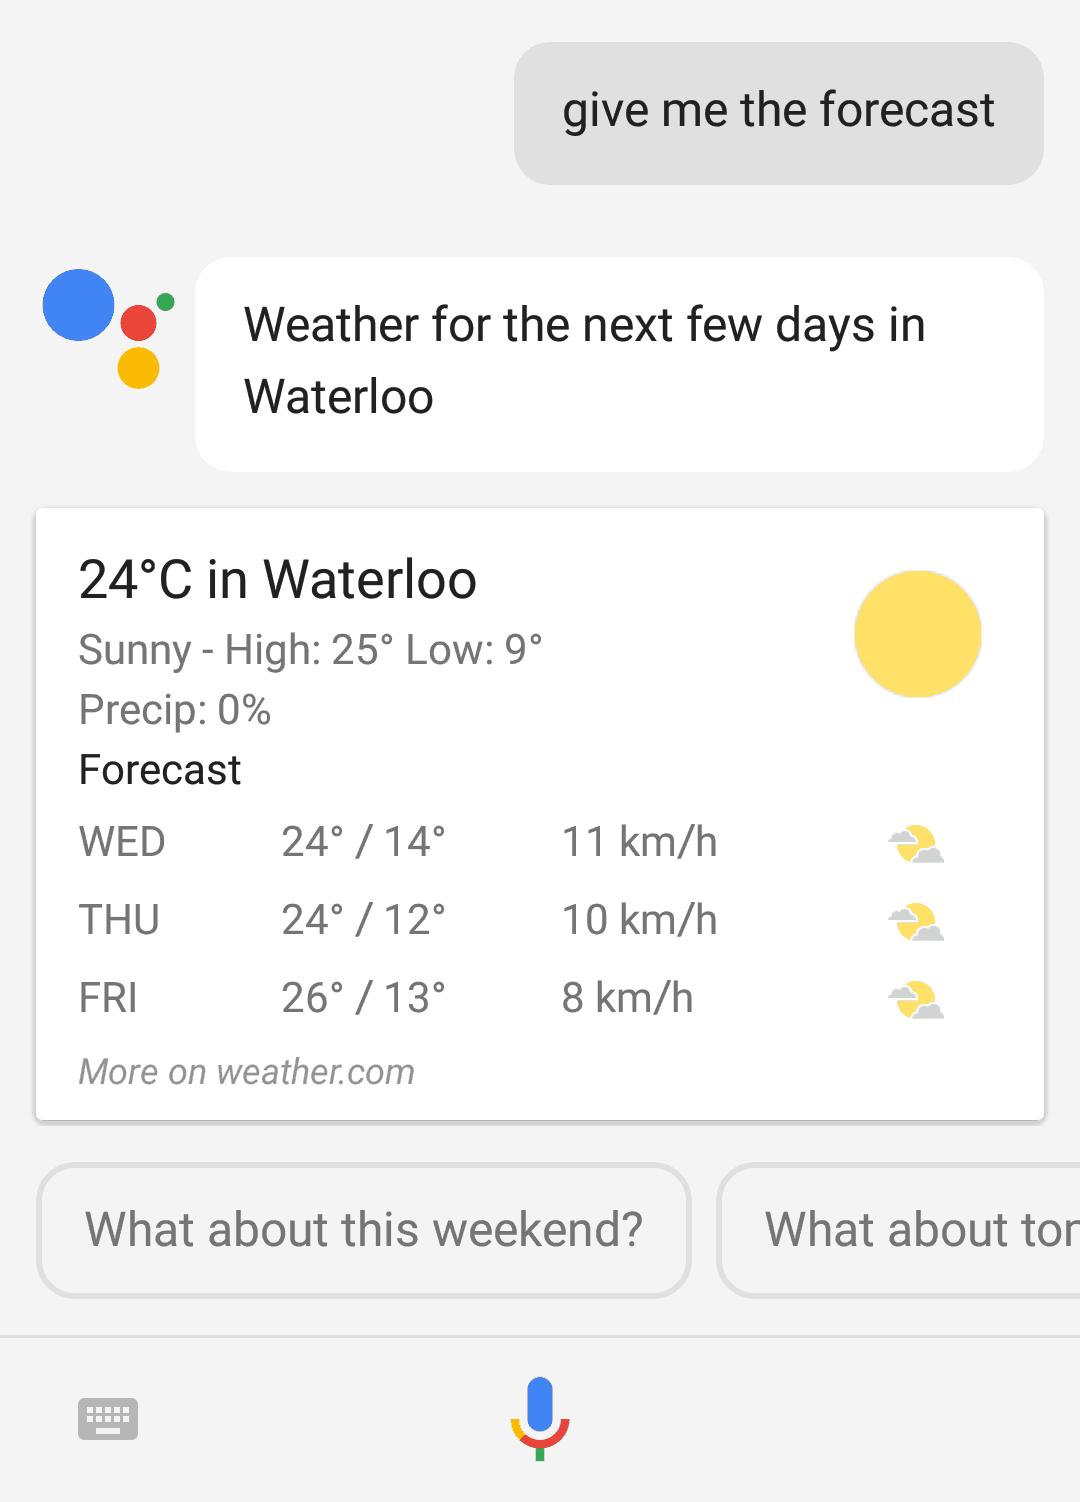 Google Assistant updating dynamic information